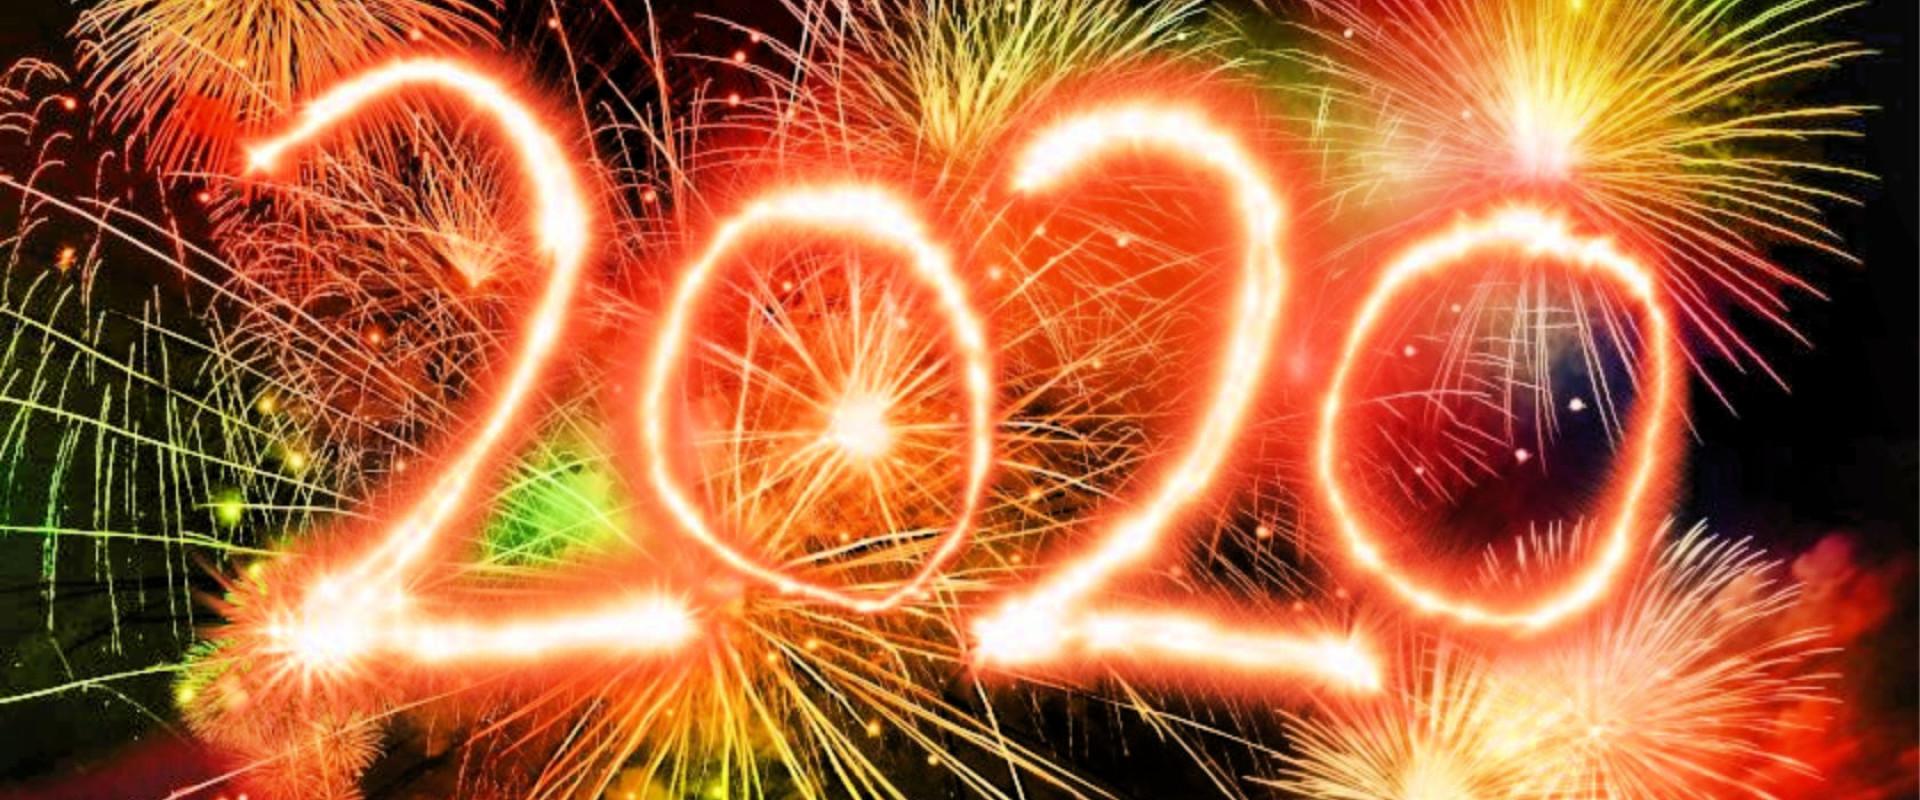 20 Tips om je loopbaan in 2020 lekker te laten knallen